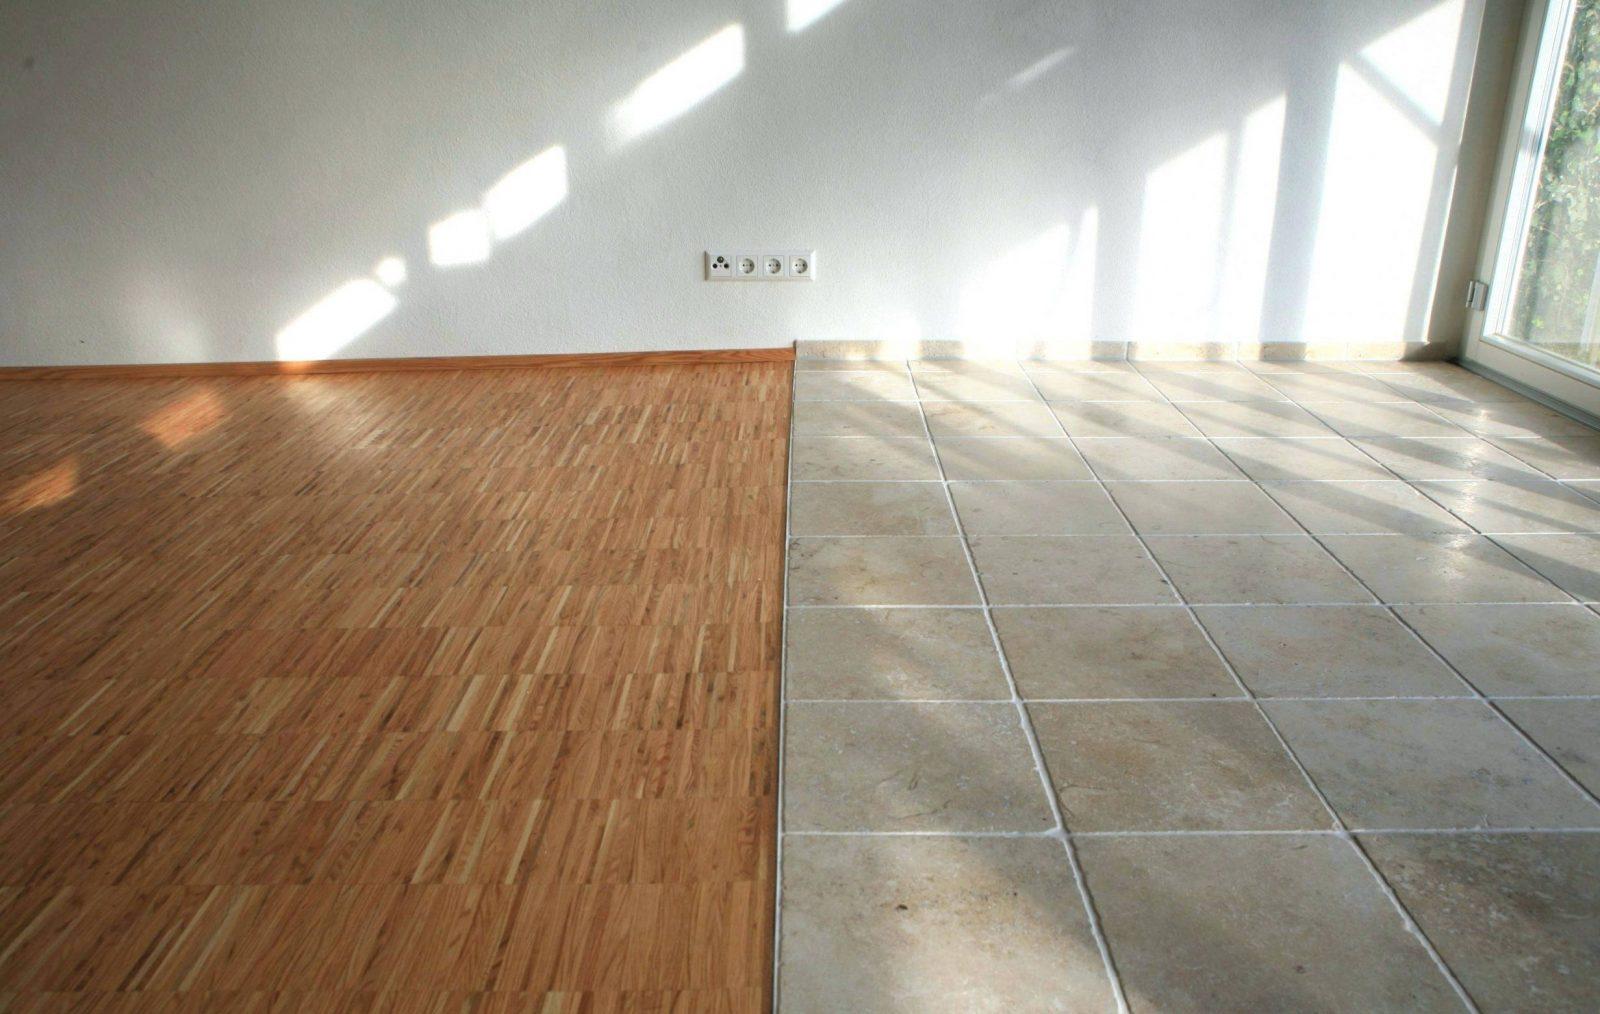 vinyl selbstklebend schanheit selbstklebender vinylboden. Black Bedroom Furniture Sets. Home Design Ideas